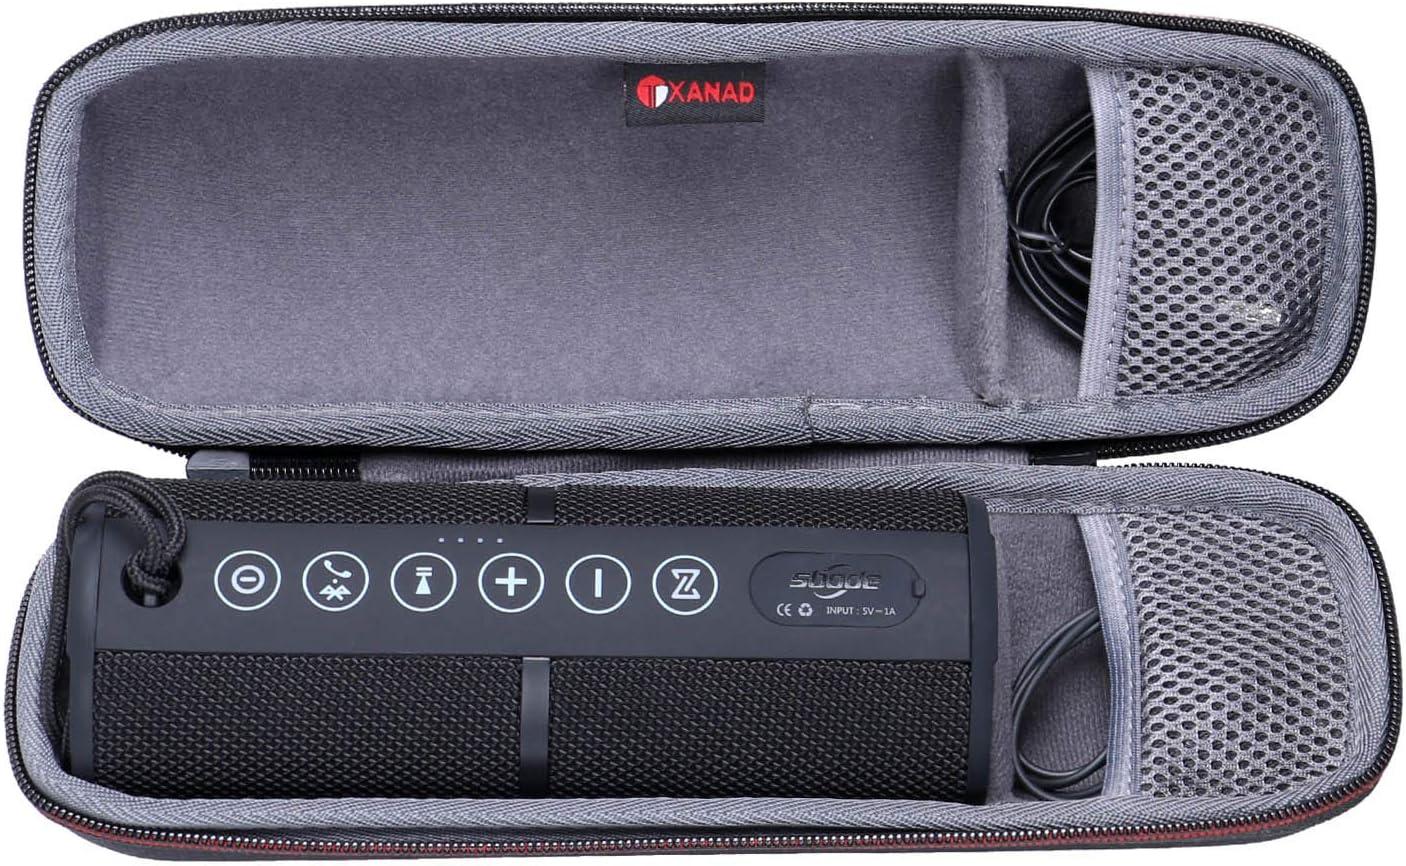 XANAD Storage Carrying Travel Hard Case for Sbode Bluetooth Speaker Grey Storage Protective Bag